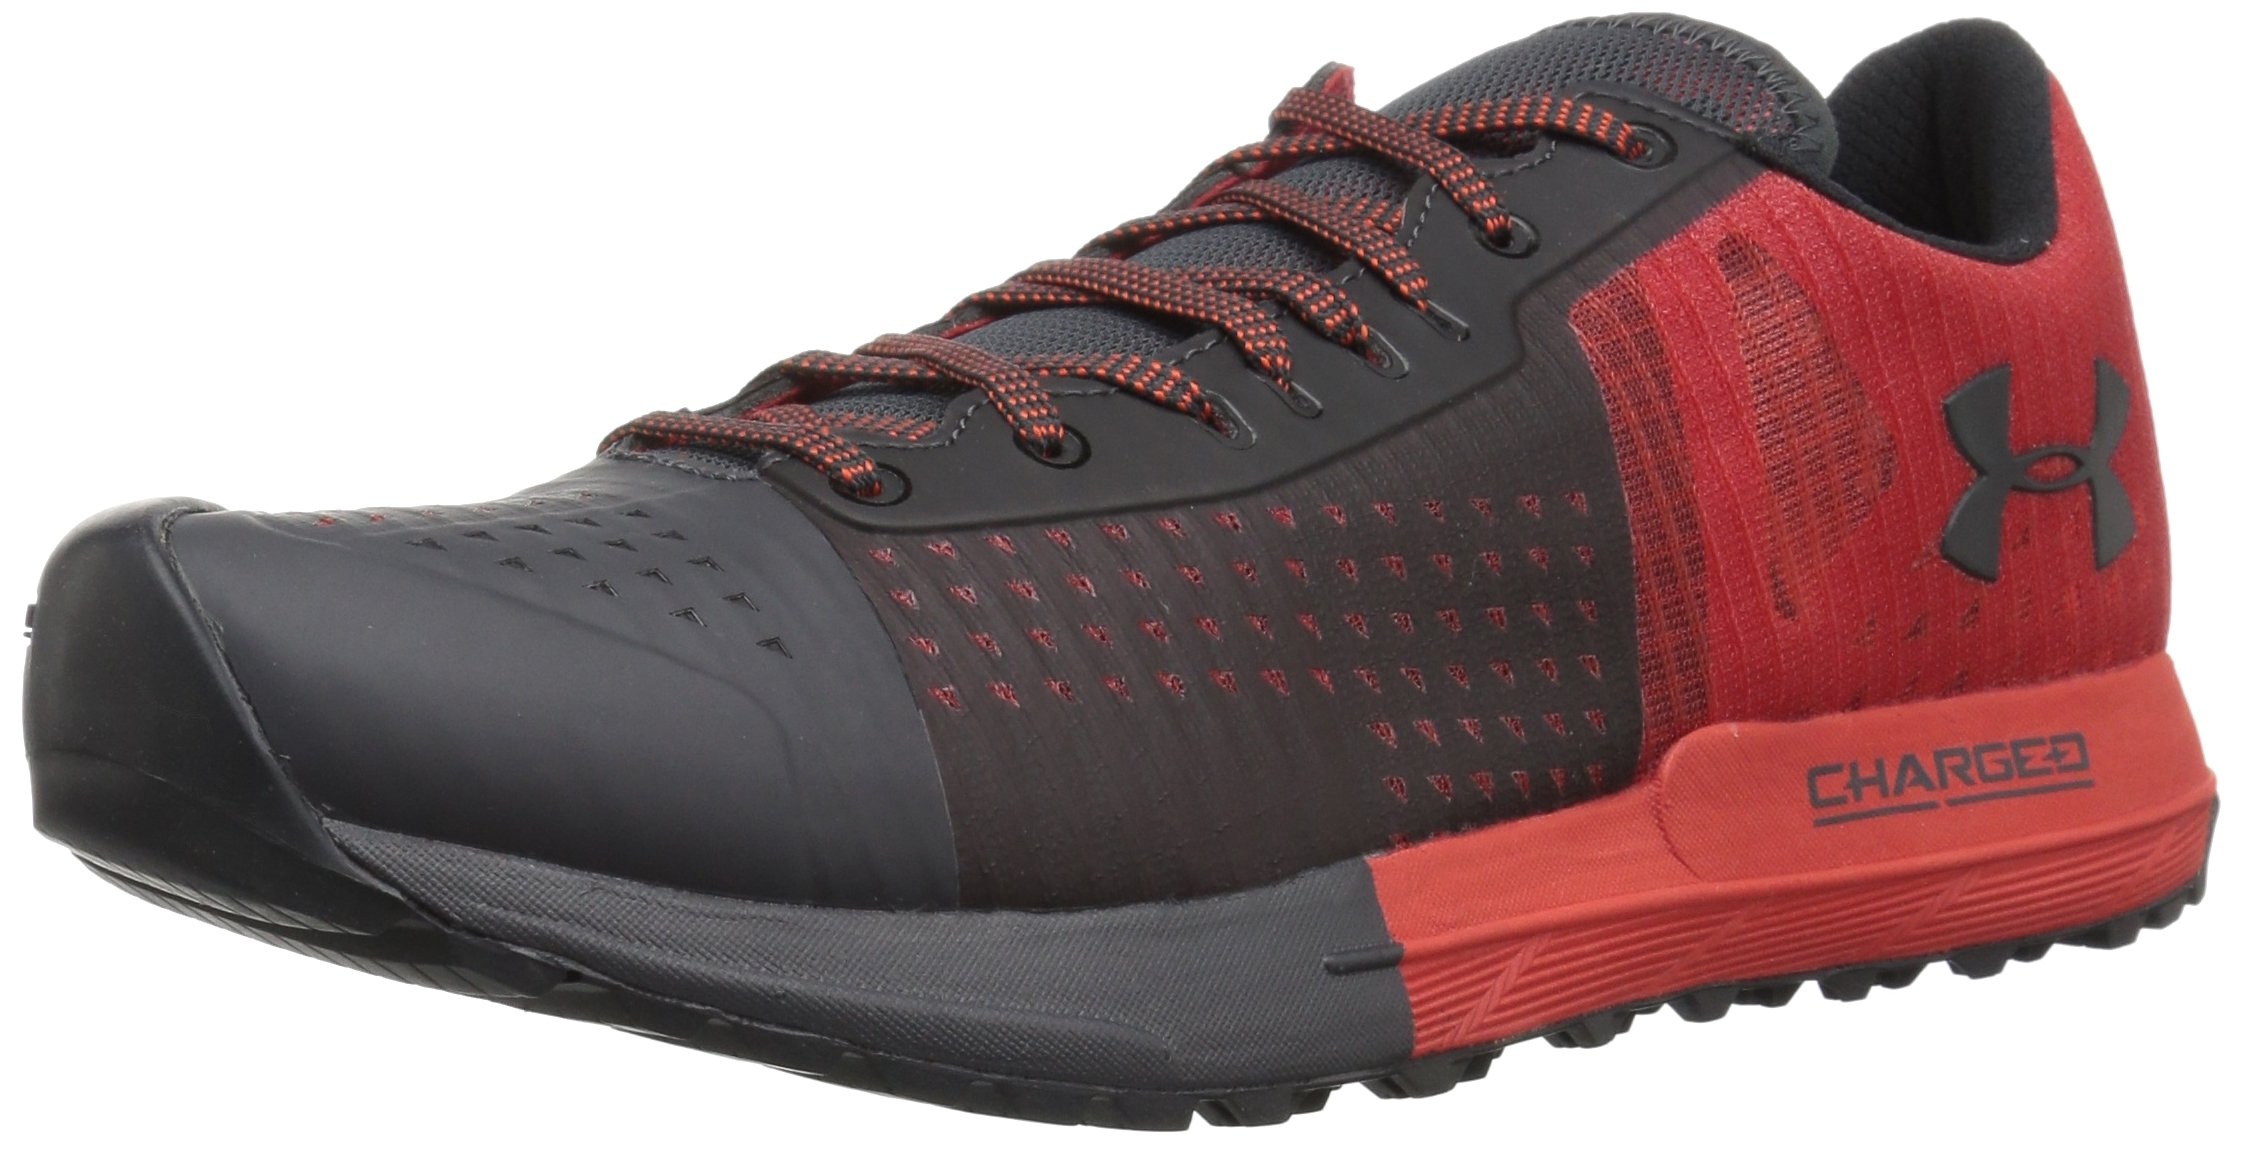 Under Armour Men's Horizon Ktv Running Shoe, Anthracite (100)/Sultry, 8.5